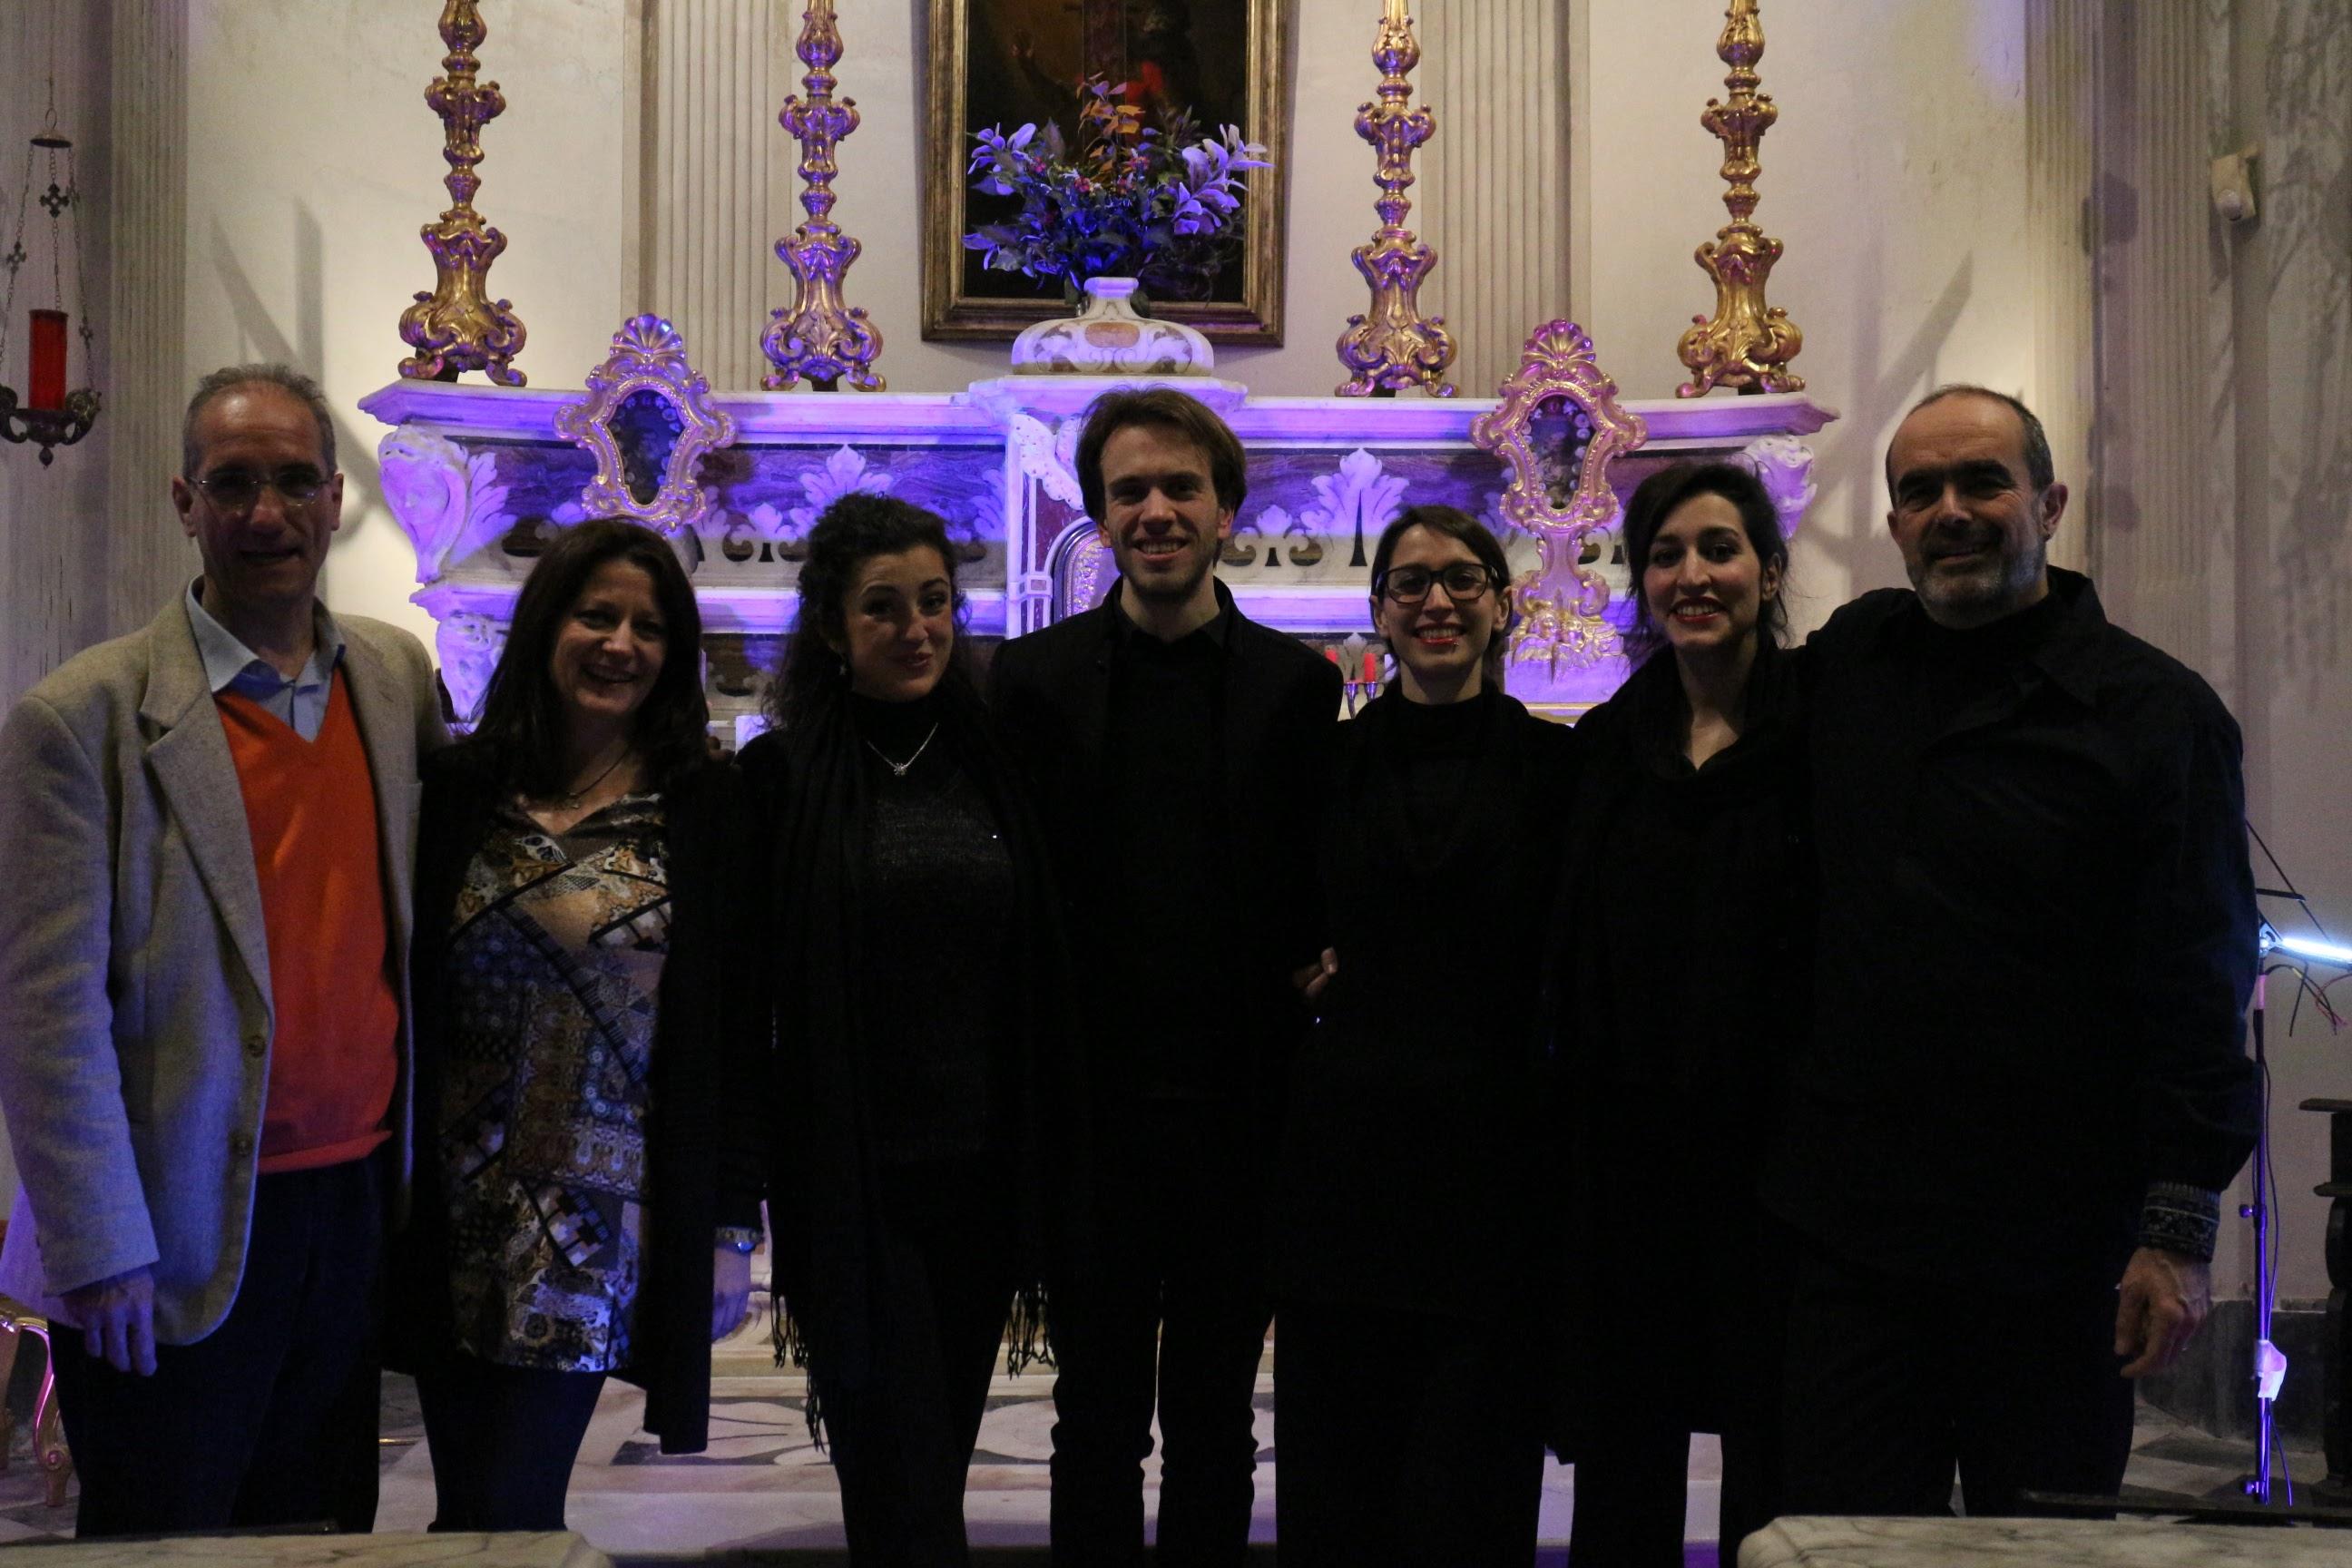 A. Basevi, C. Magnan, G. Biagi, Abstract Liquid Arkestra, Riccardo Da Pelo, Genova 2016